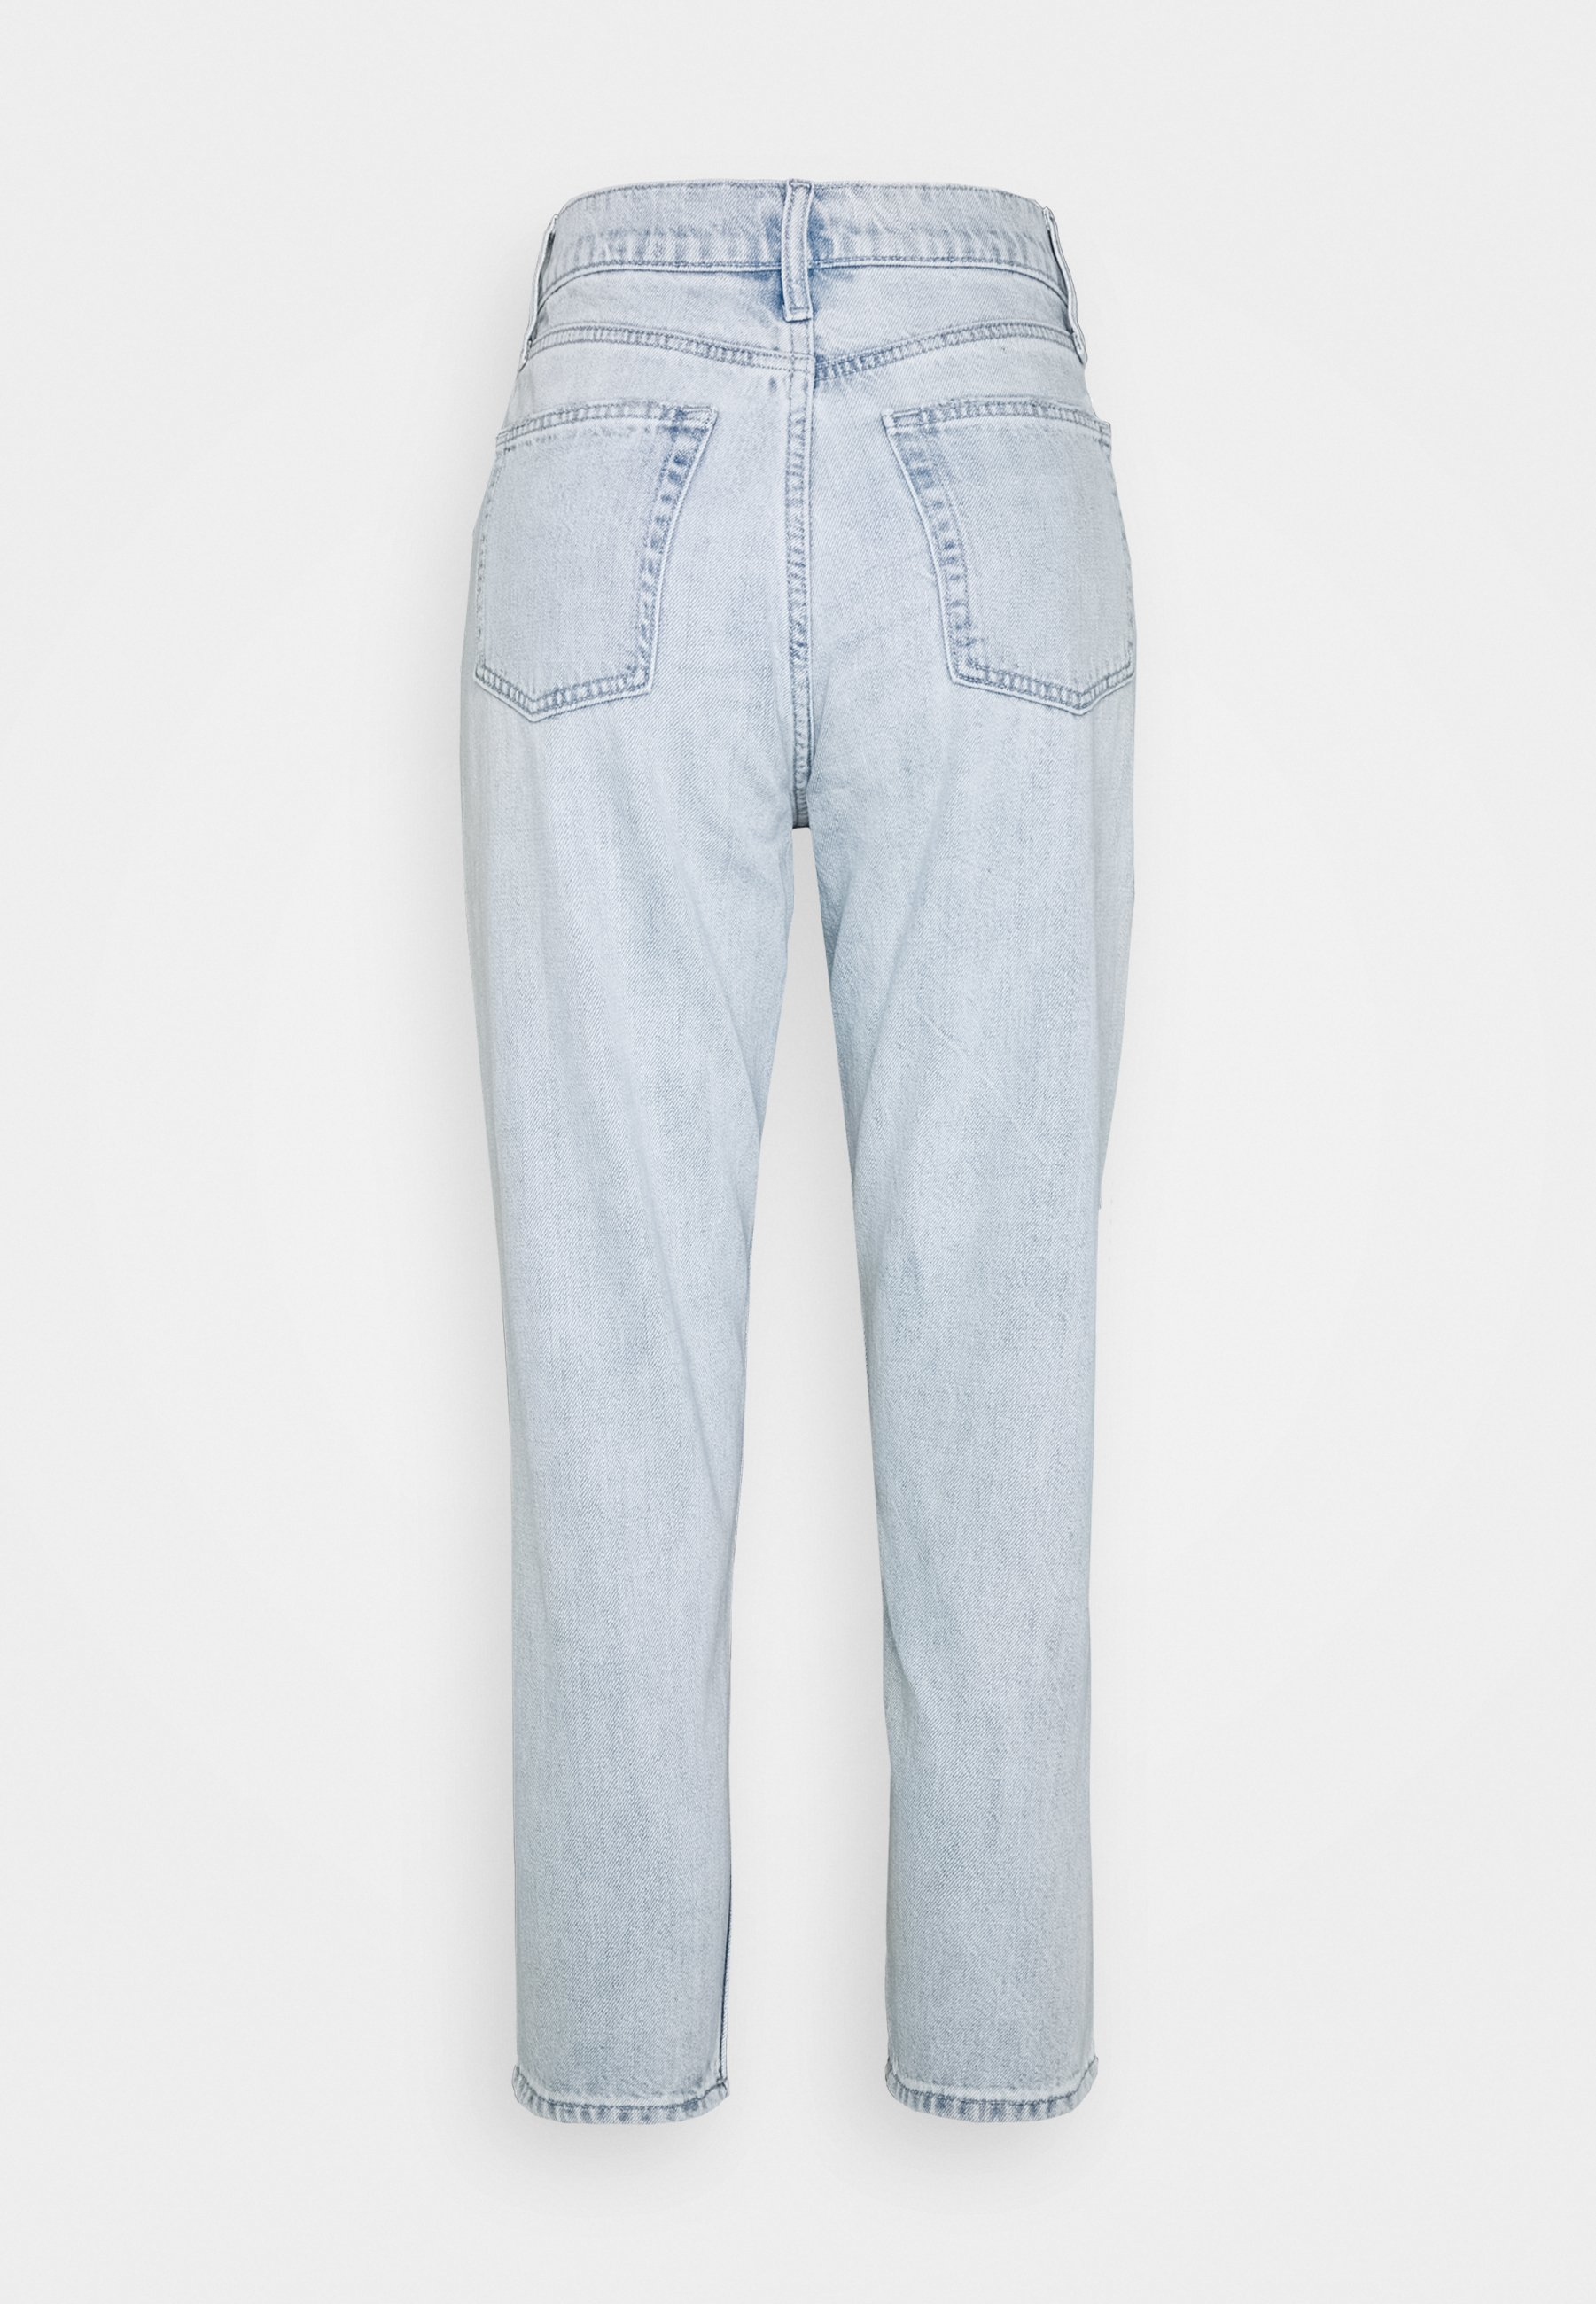 Gap Petite Mom Jean Caspian - Relaxed Fit Jeans Light Indigo